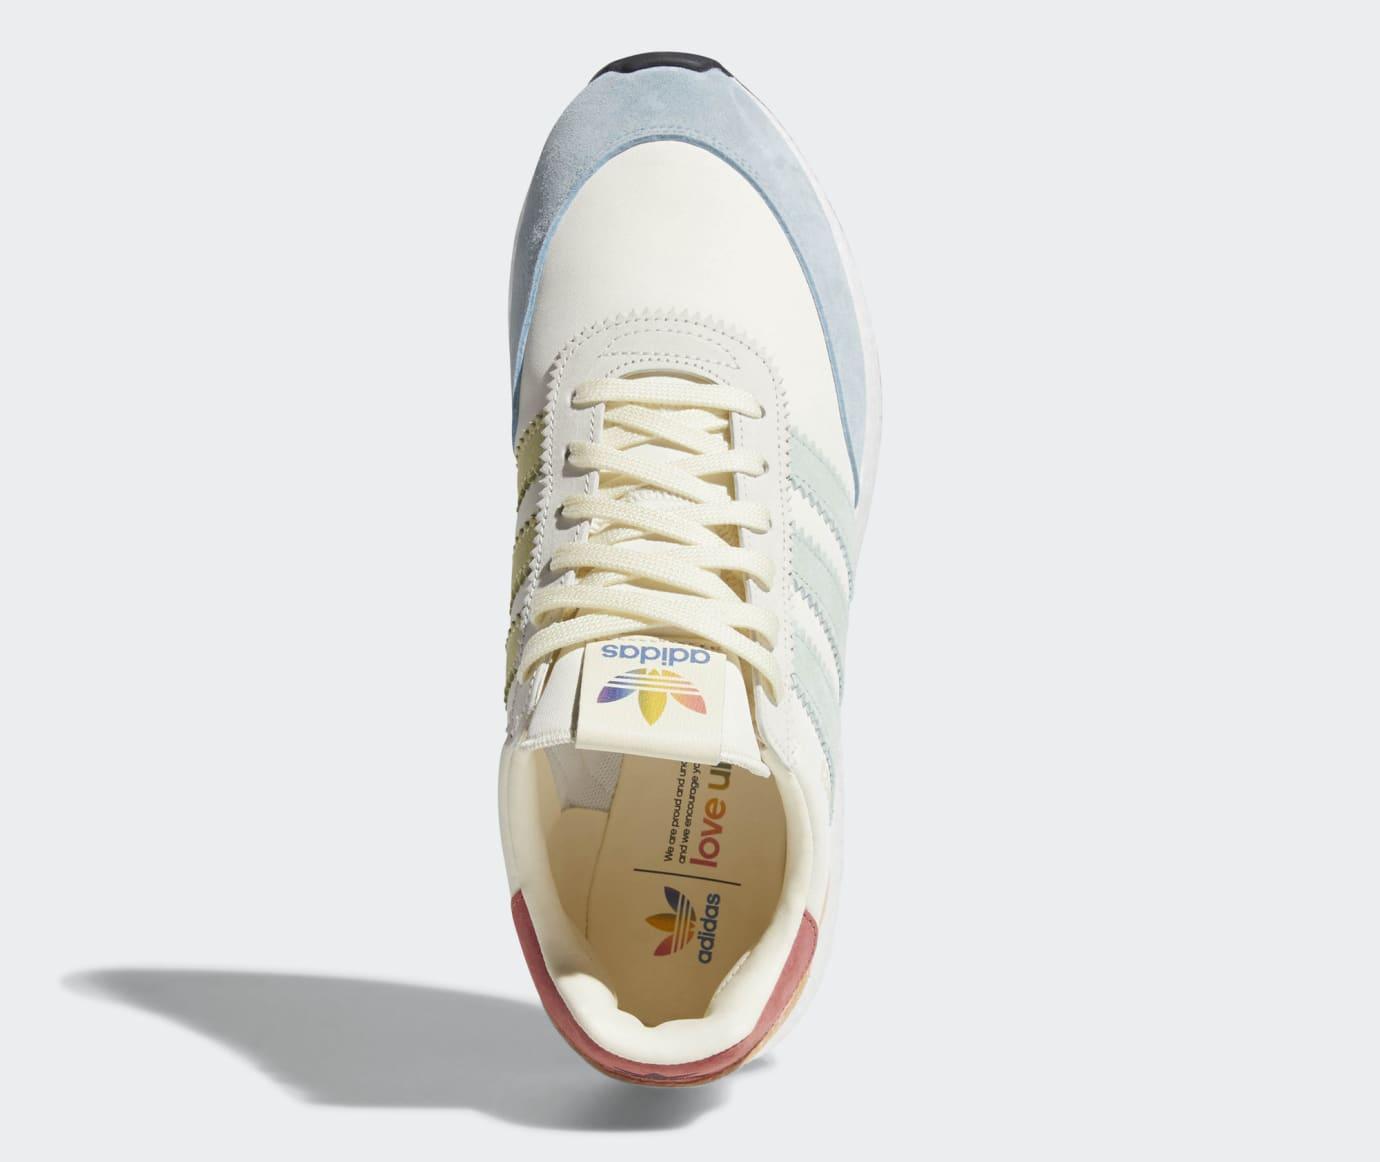 Adidas I-5923 'Pride' B41984 (Top)